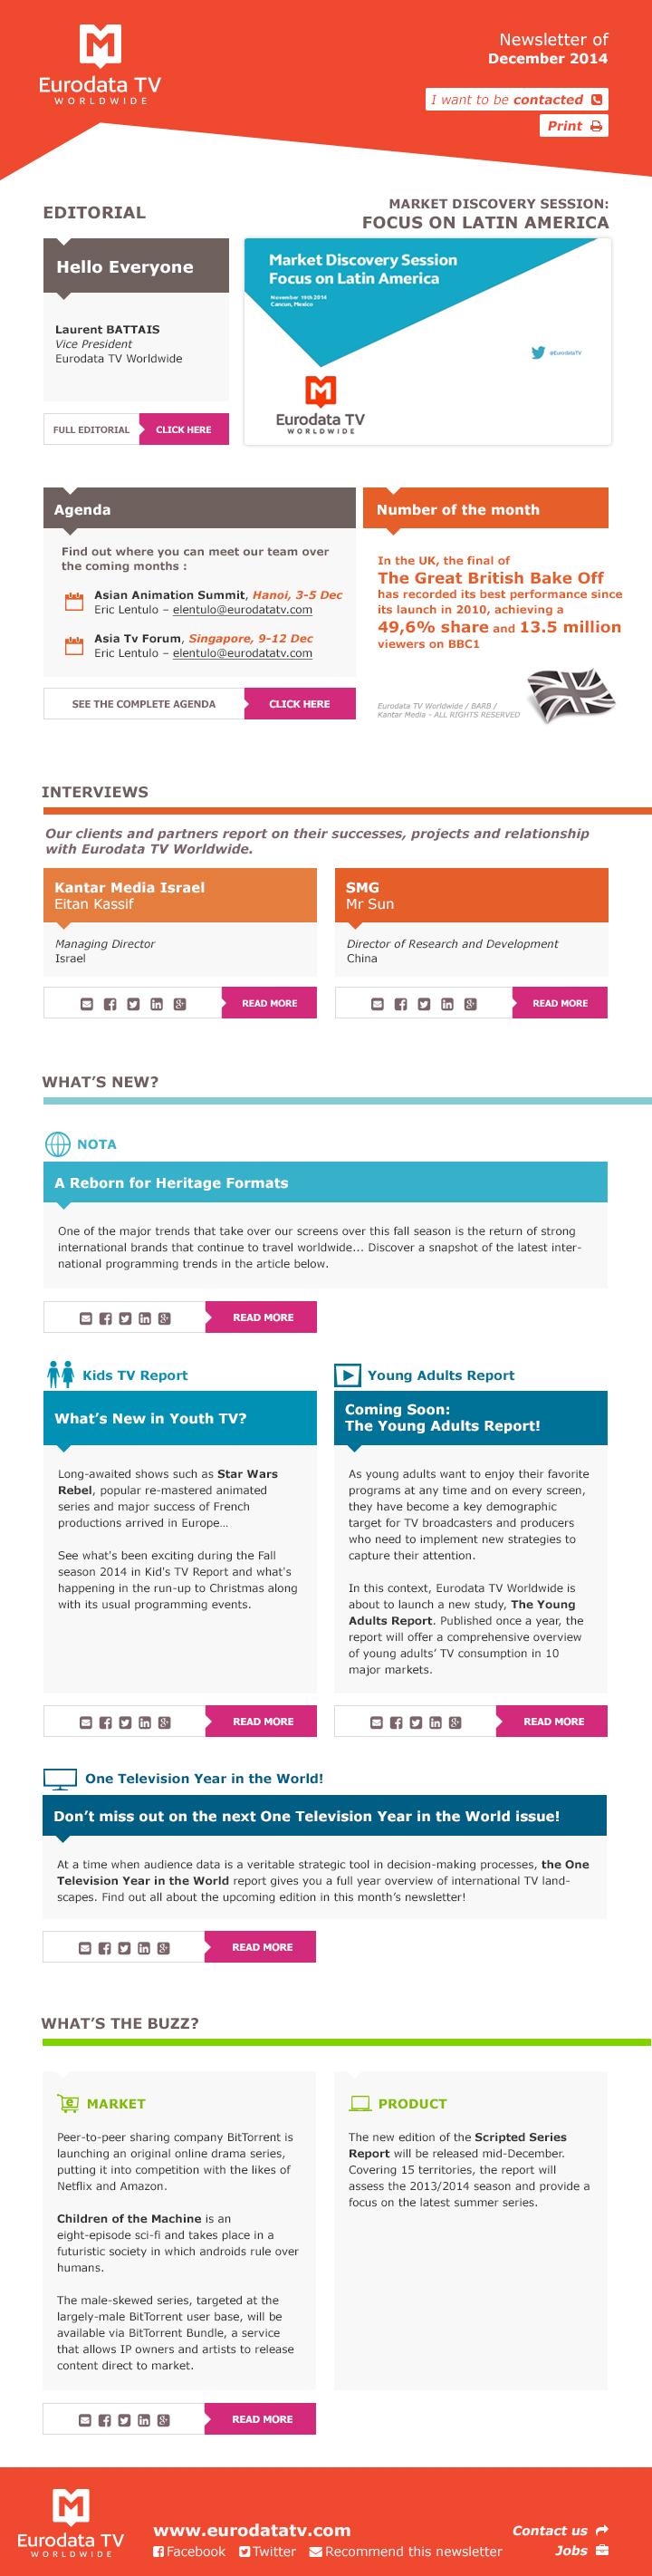 Exemples de newsletters - Agence Web Mailmarketing